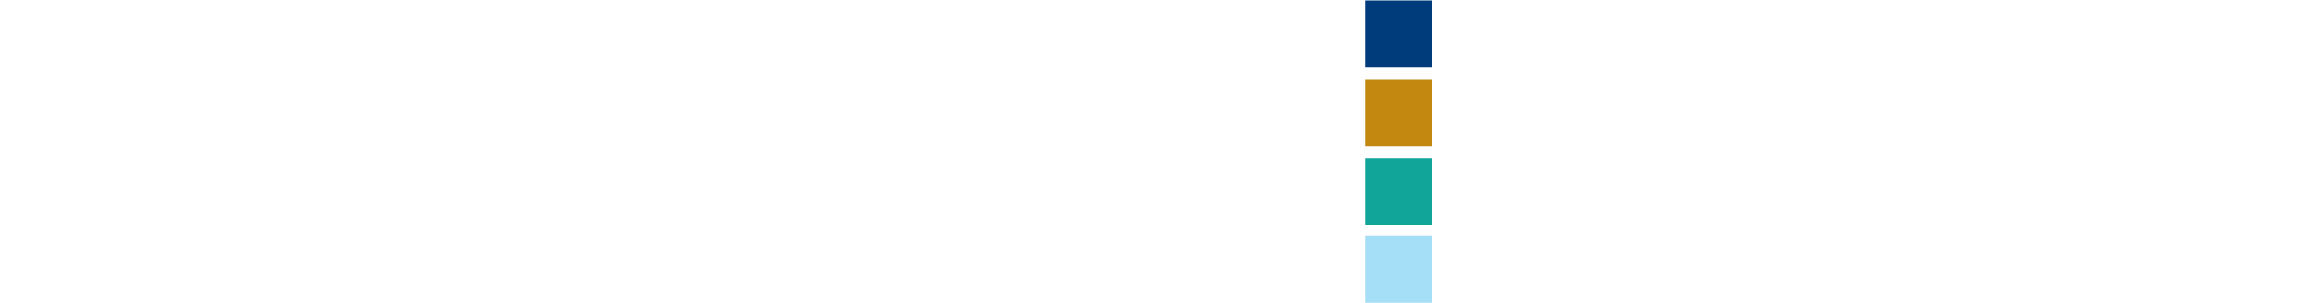 calero-mdsl-vector-recolor-CMYK-white